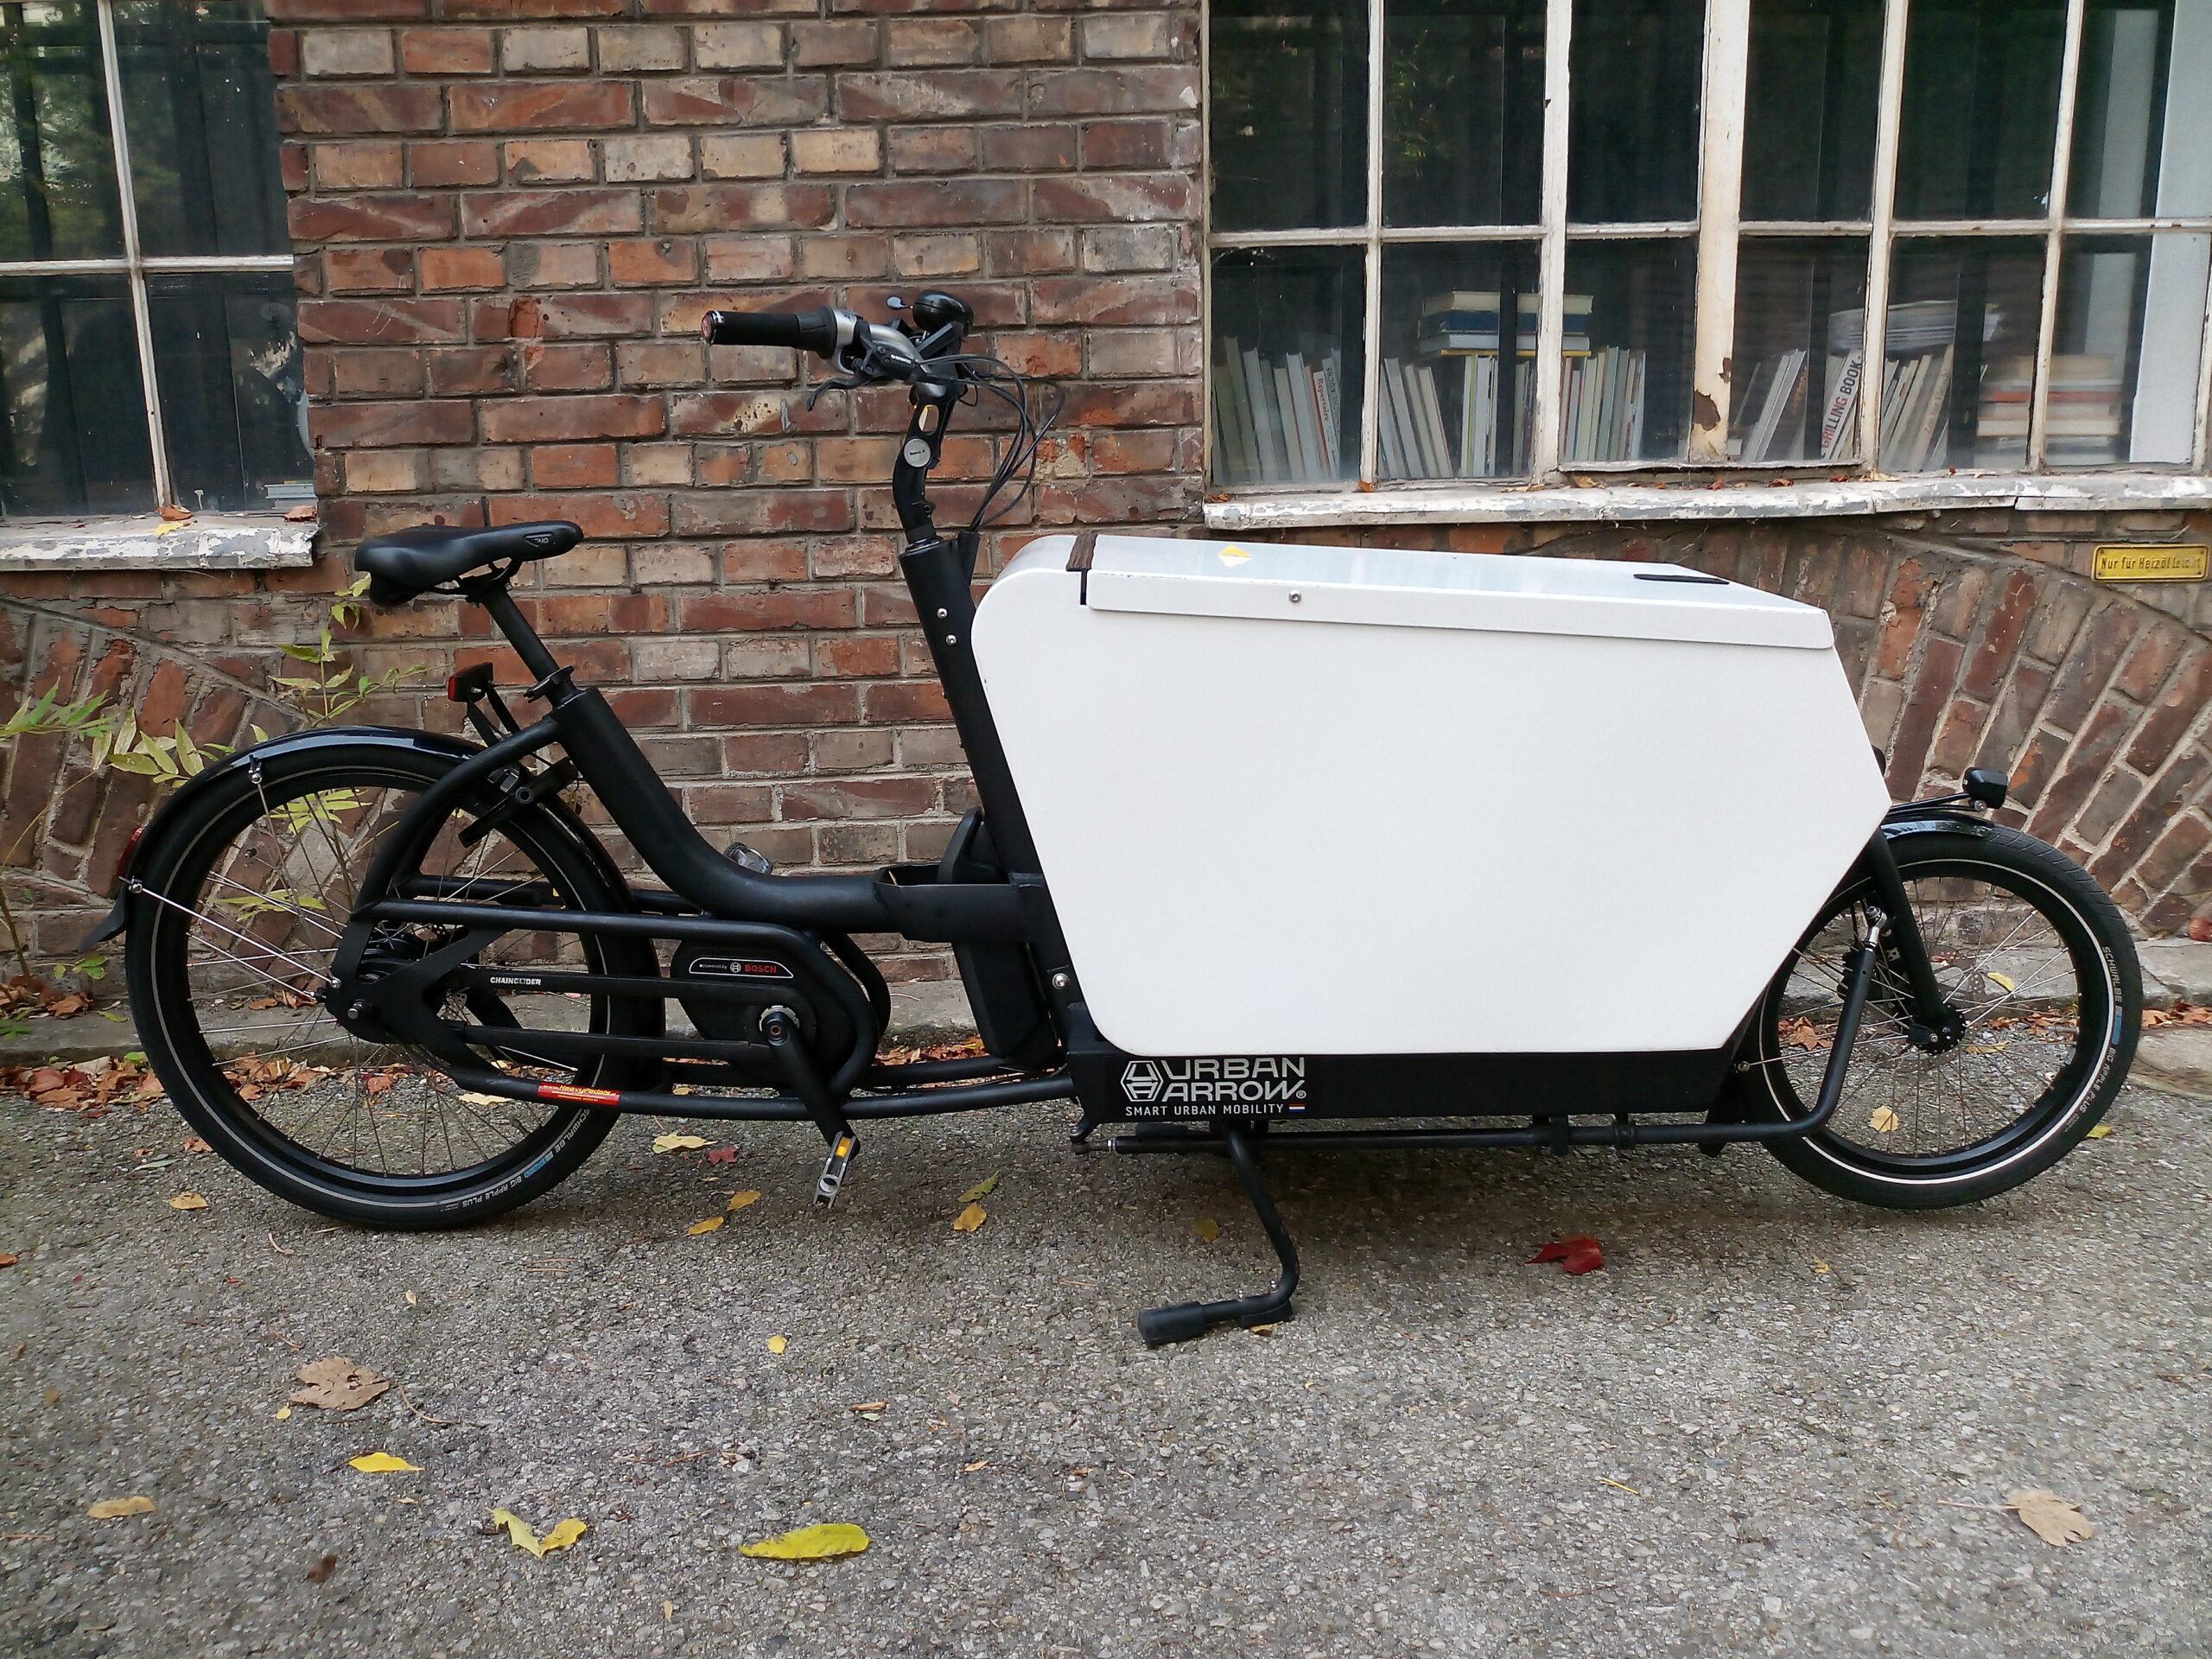 Urban Arrow Lastenrad in Wien kaufen - Heavy Pedals